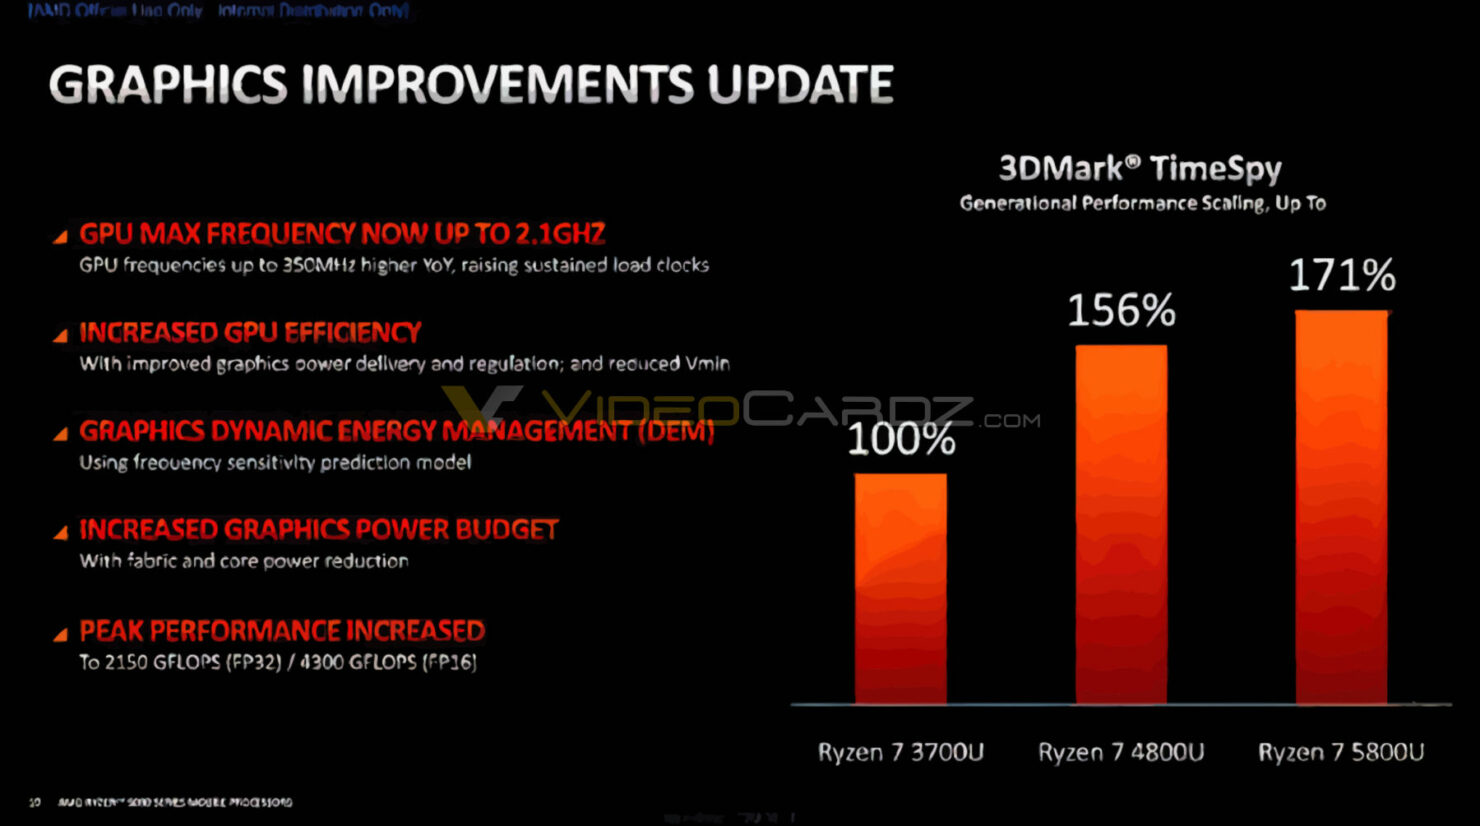 amd-ryzen-graphics-improvements